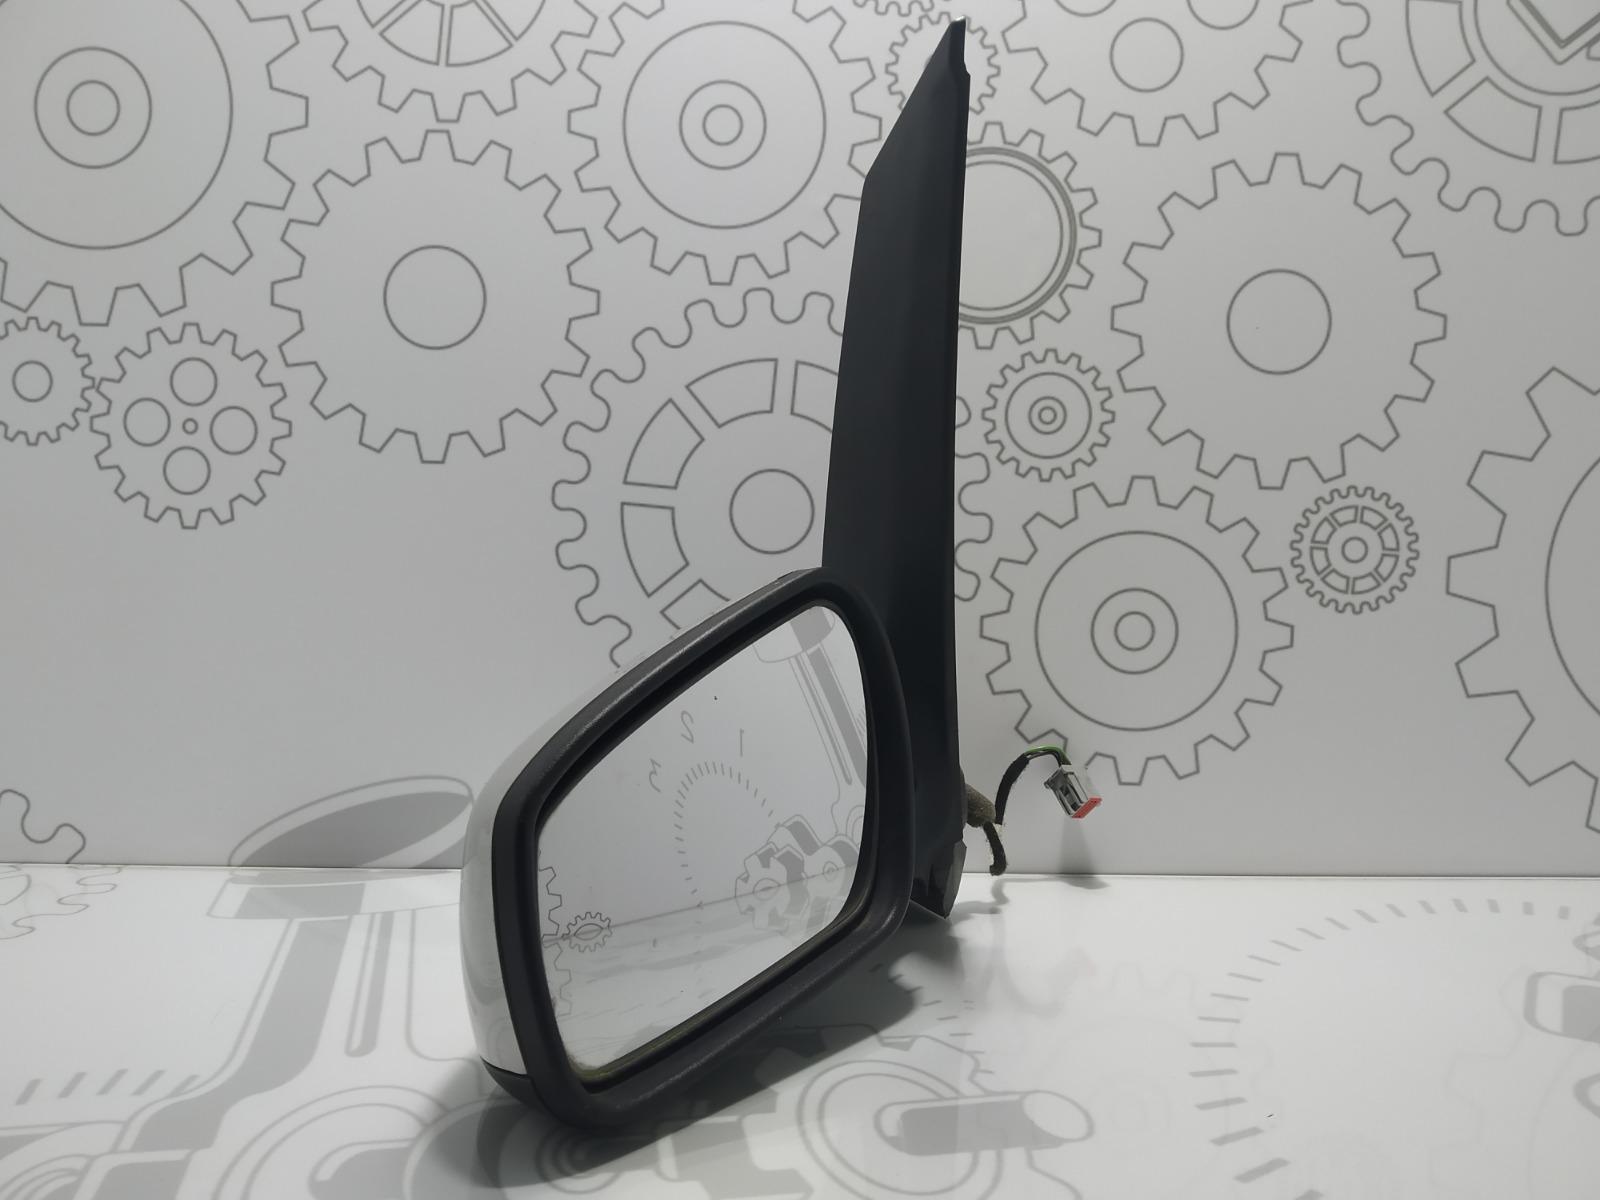 Зеркало наружное левое Ford C-Max 1.8 TDCI 2008 (б/у)